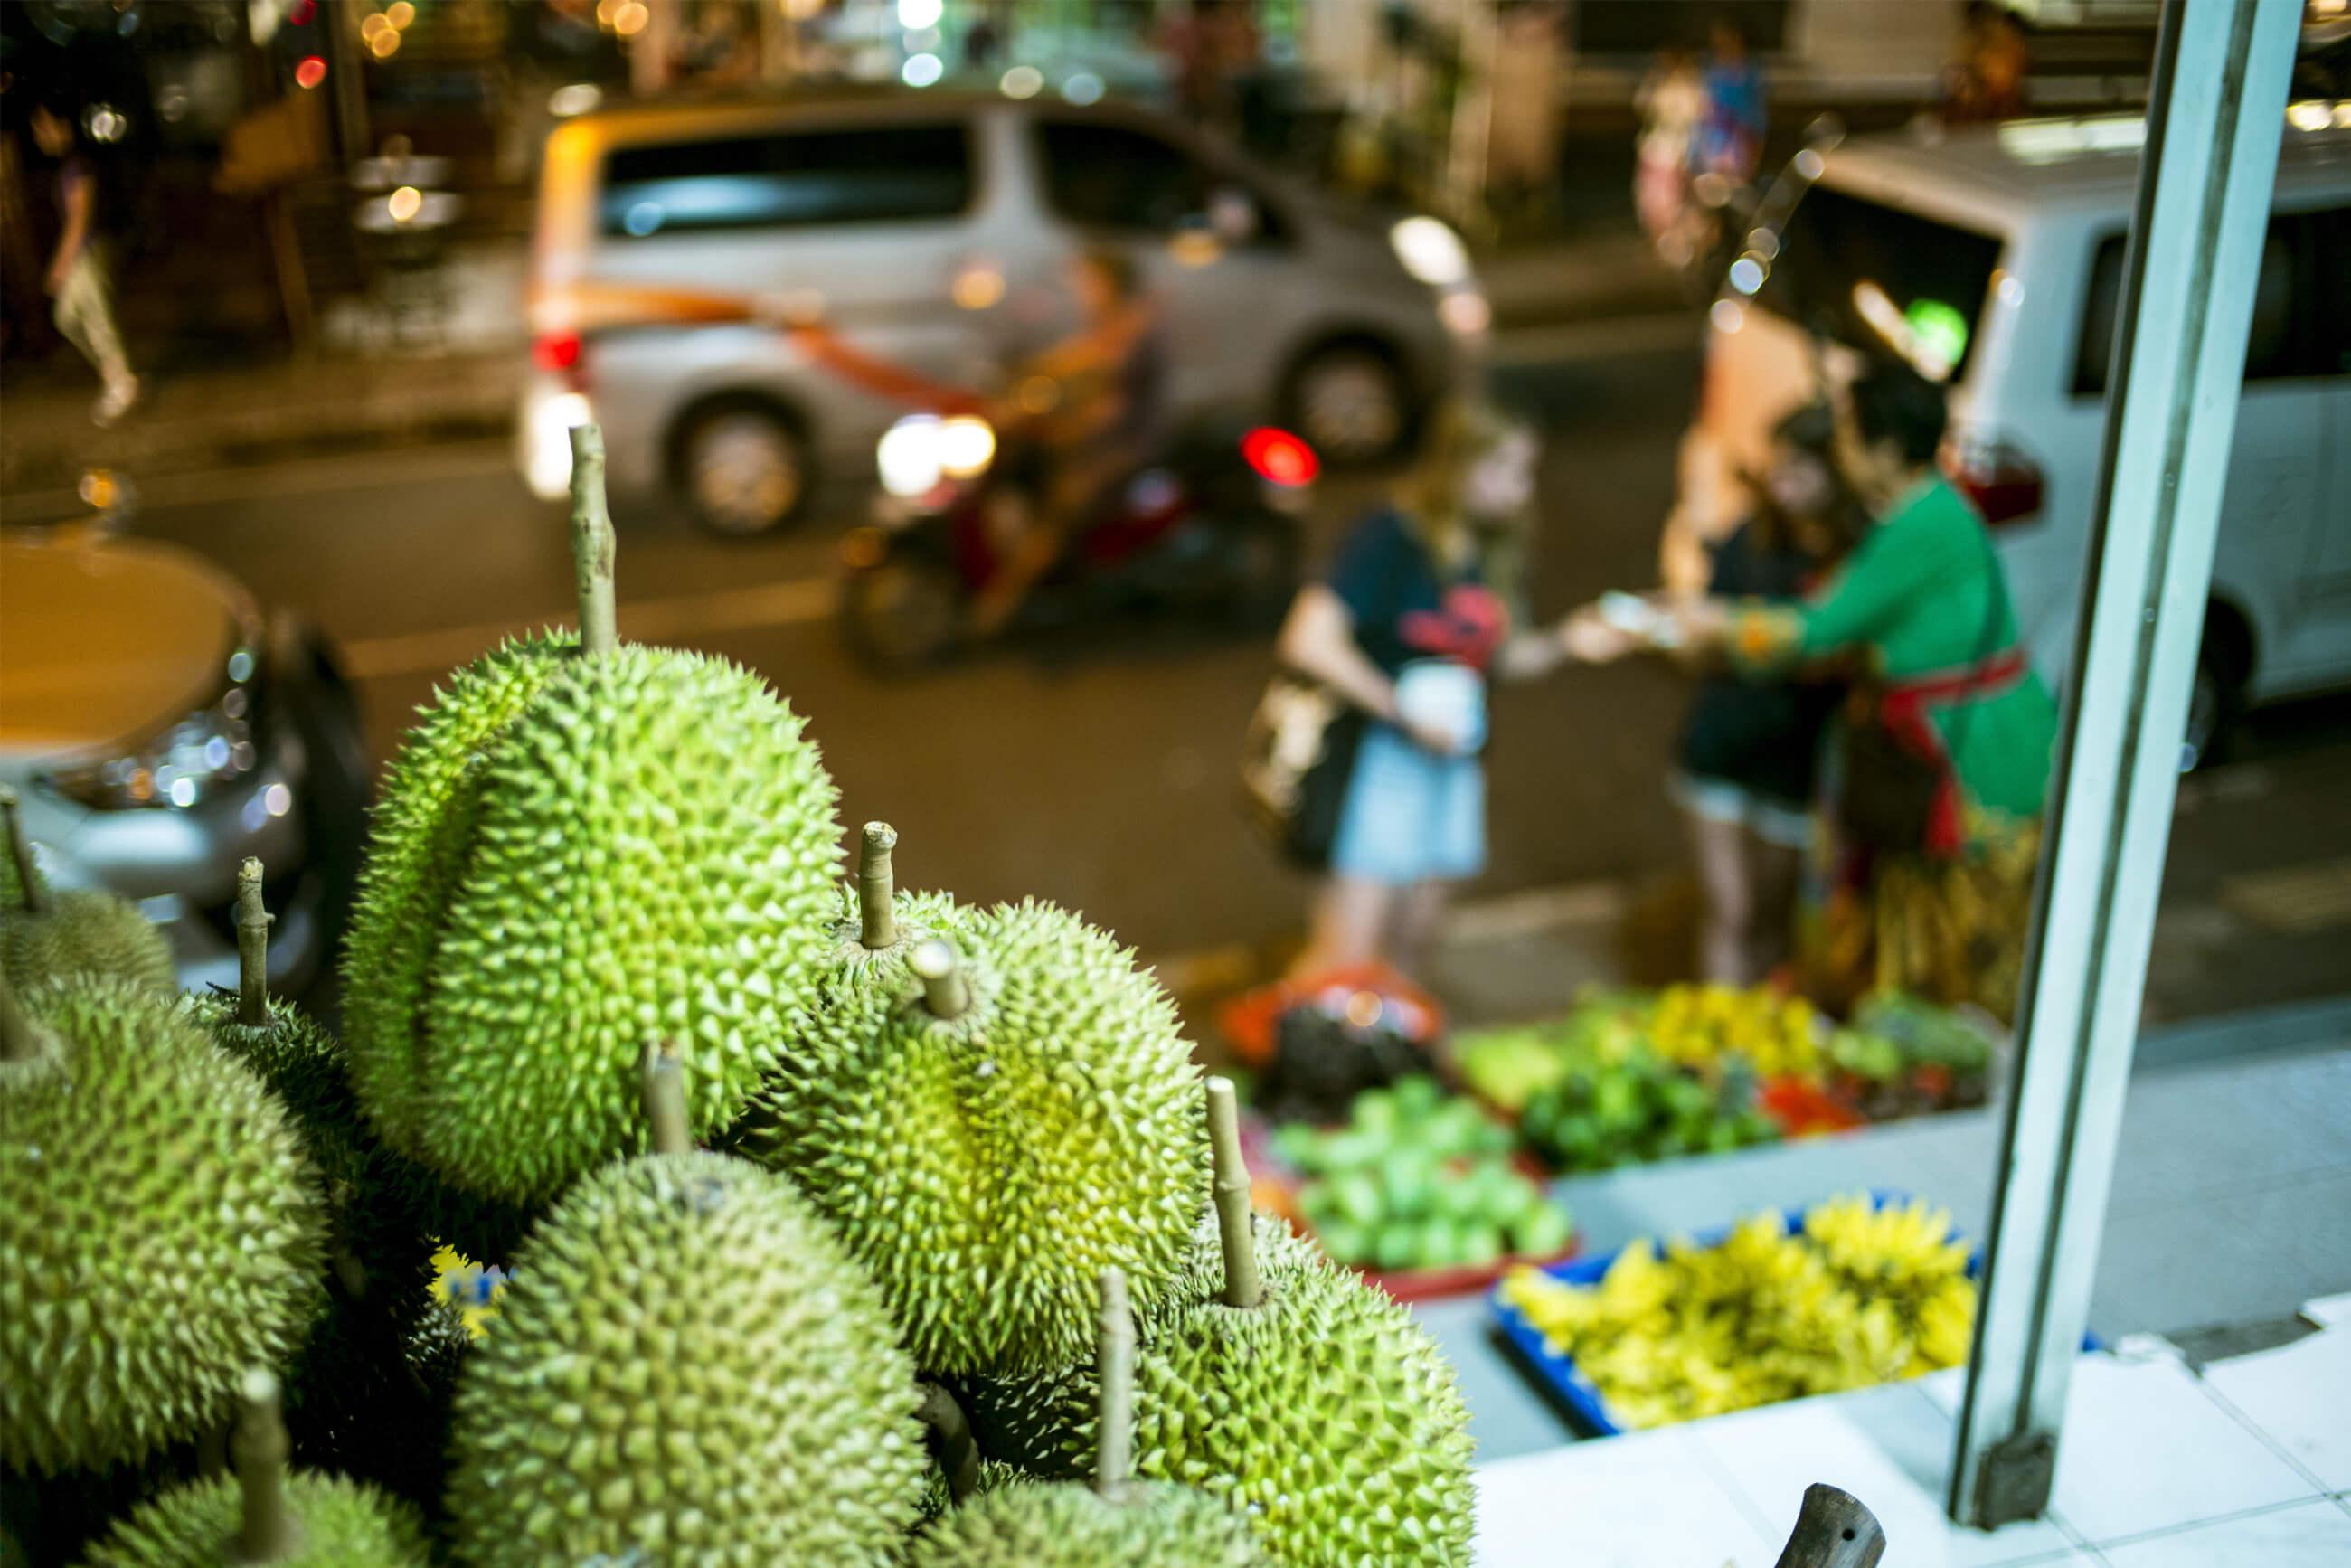 https://bubo.sk/uploads/galleries/7304/lubosfellner_indonezia_bali_durian.jpg